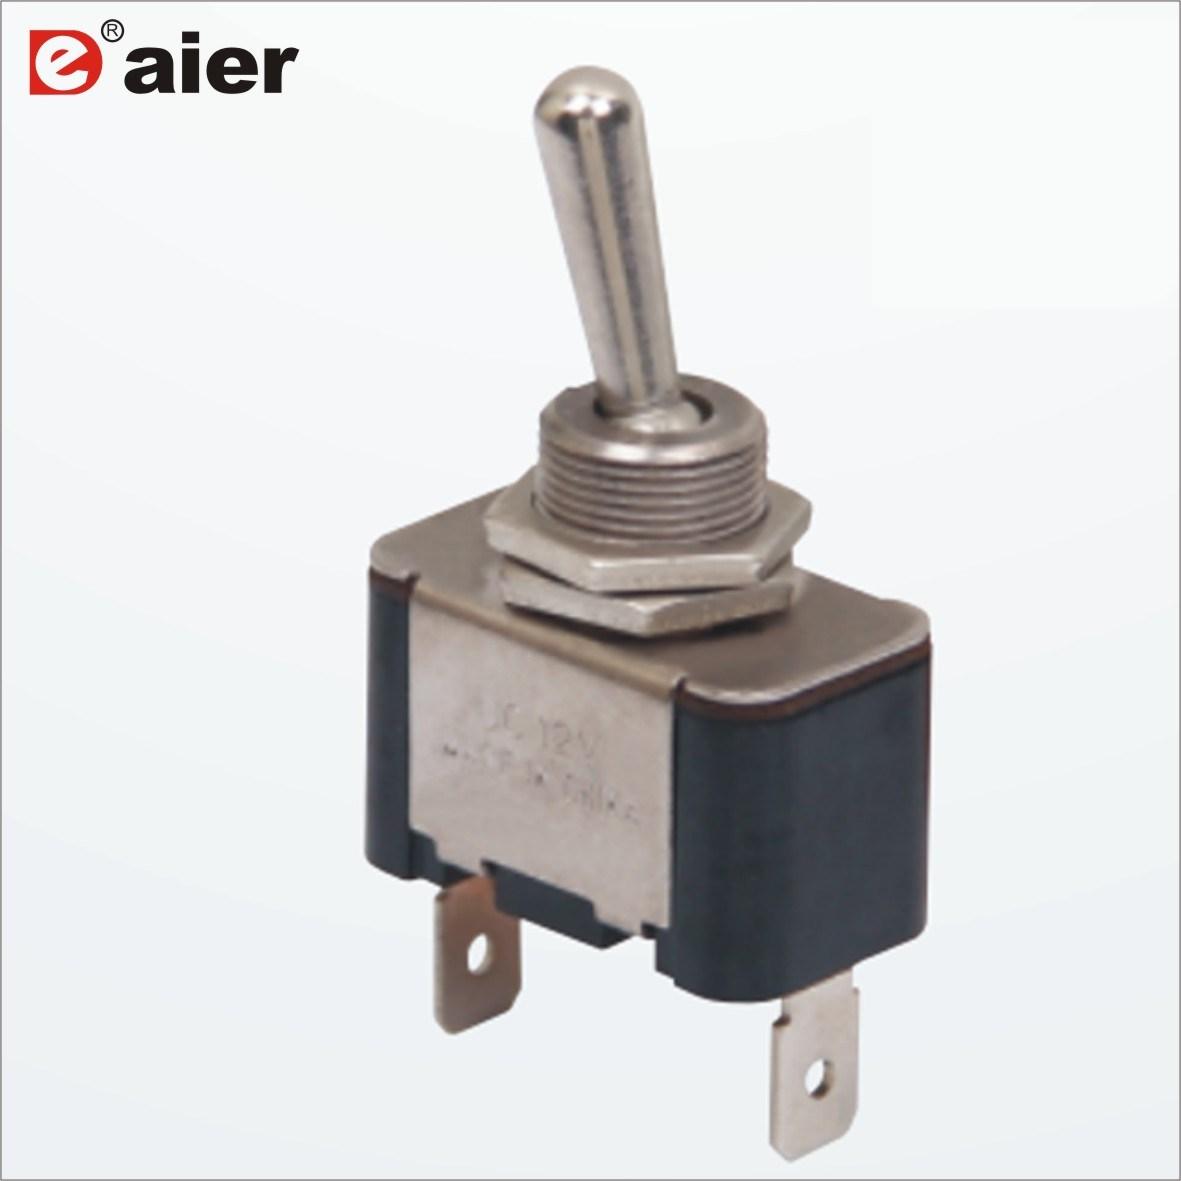 China Metal On Off Locking 2 Way 15a Pcb Toggle Switch Electronics